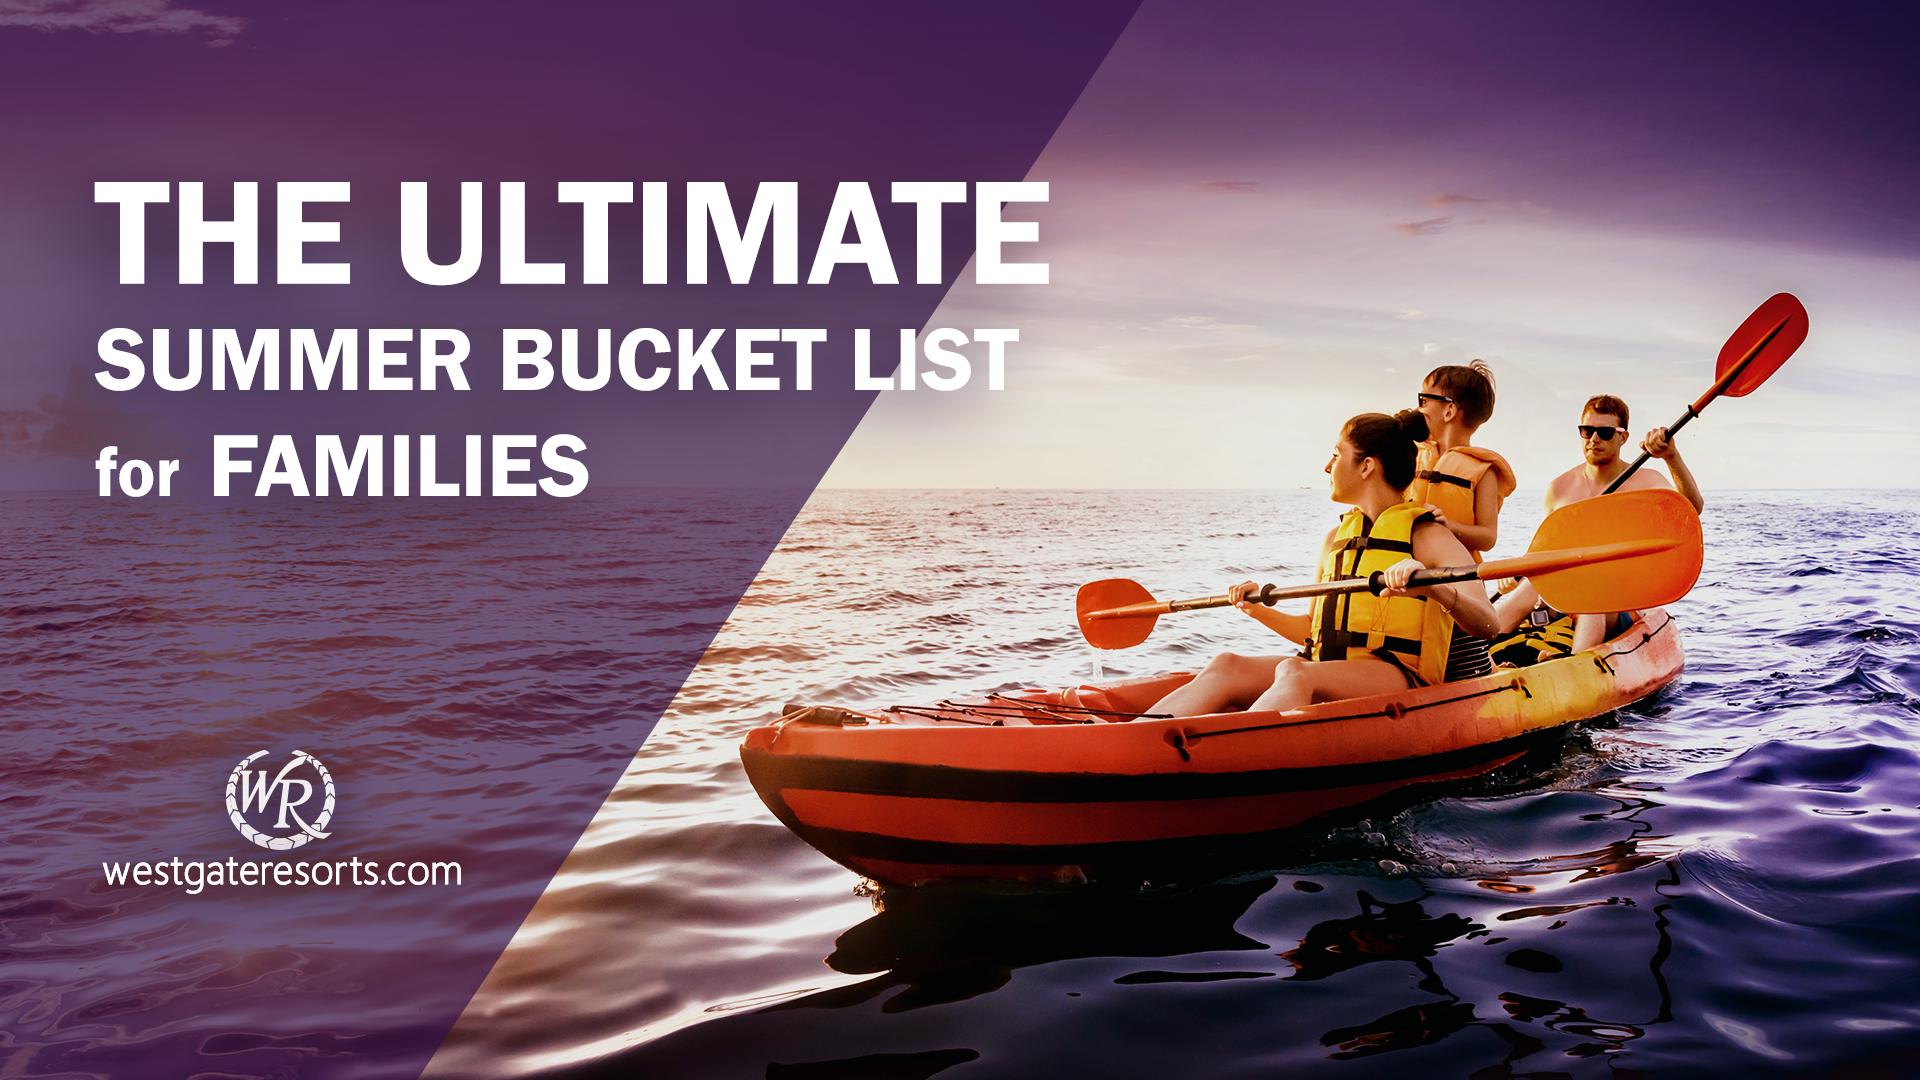 The Ultimate Summer Bucket List for Families | Summer Bucket List Ideas | Westgate Resorts